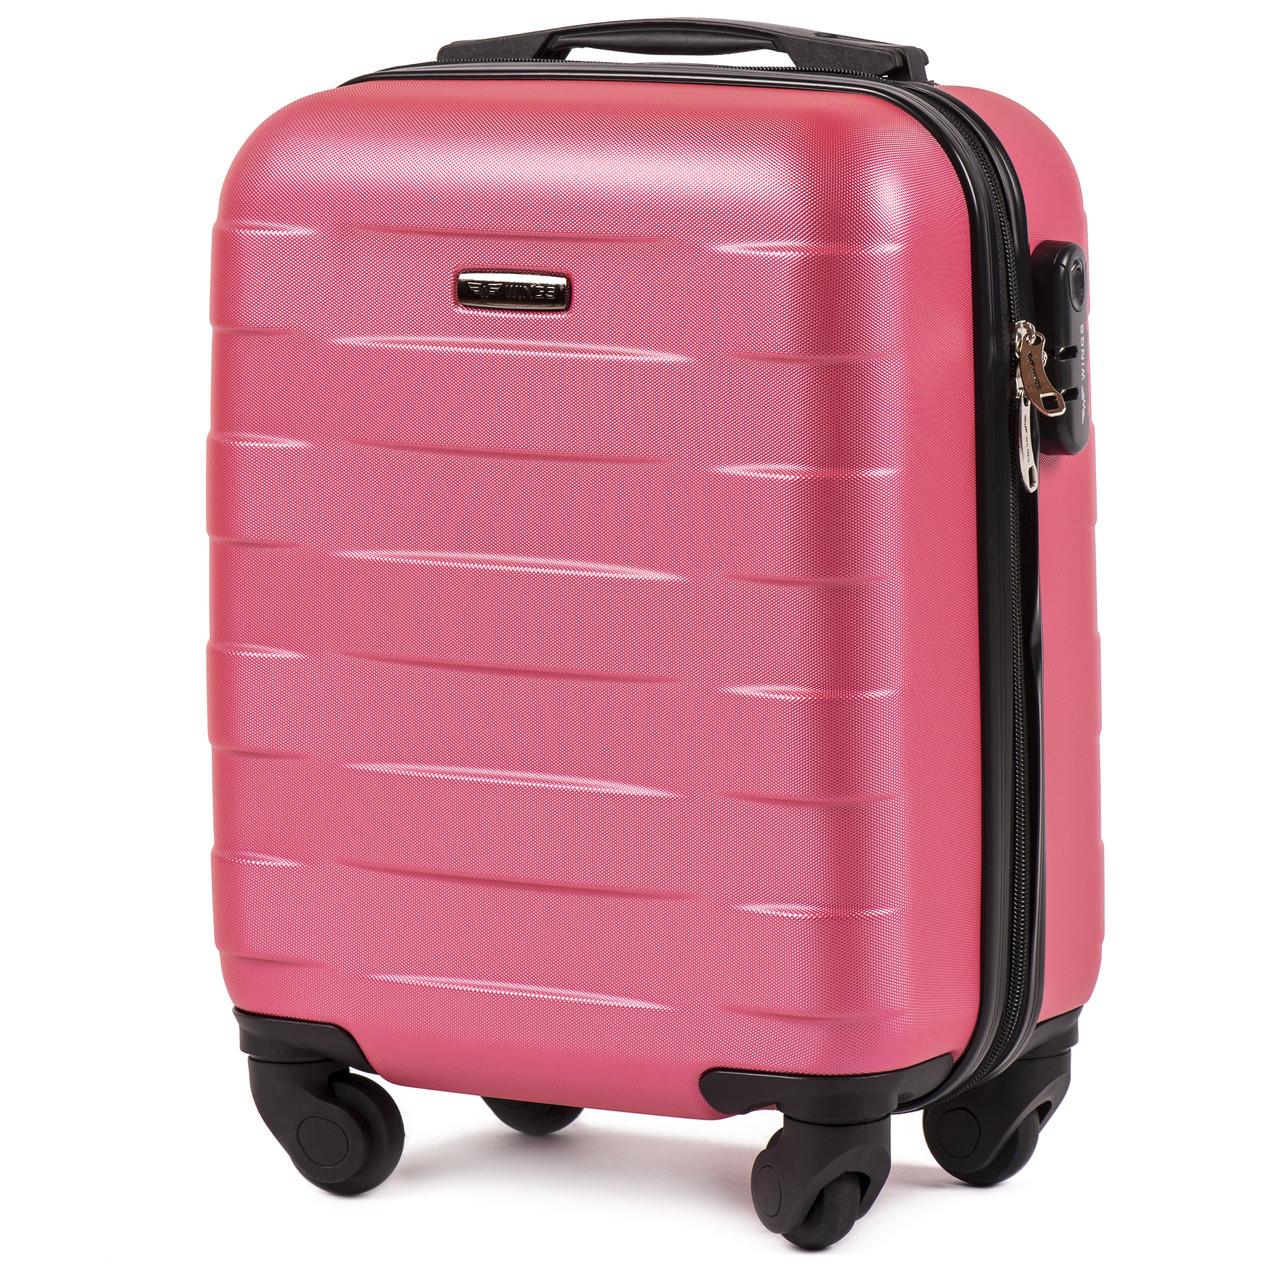 Микро пластиковый чемодан Wings 401 на 4 колесах розовый, фото 1